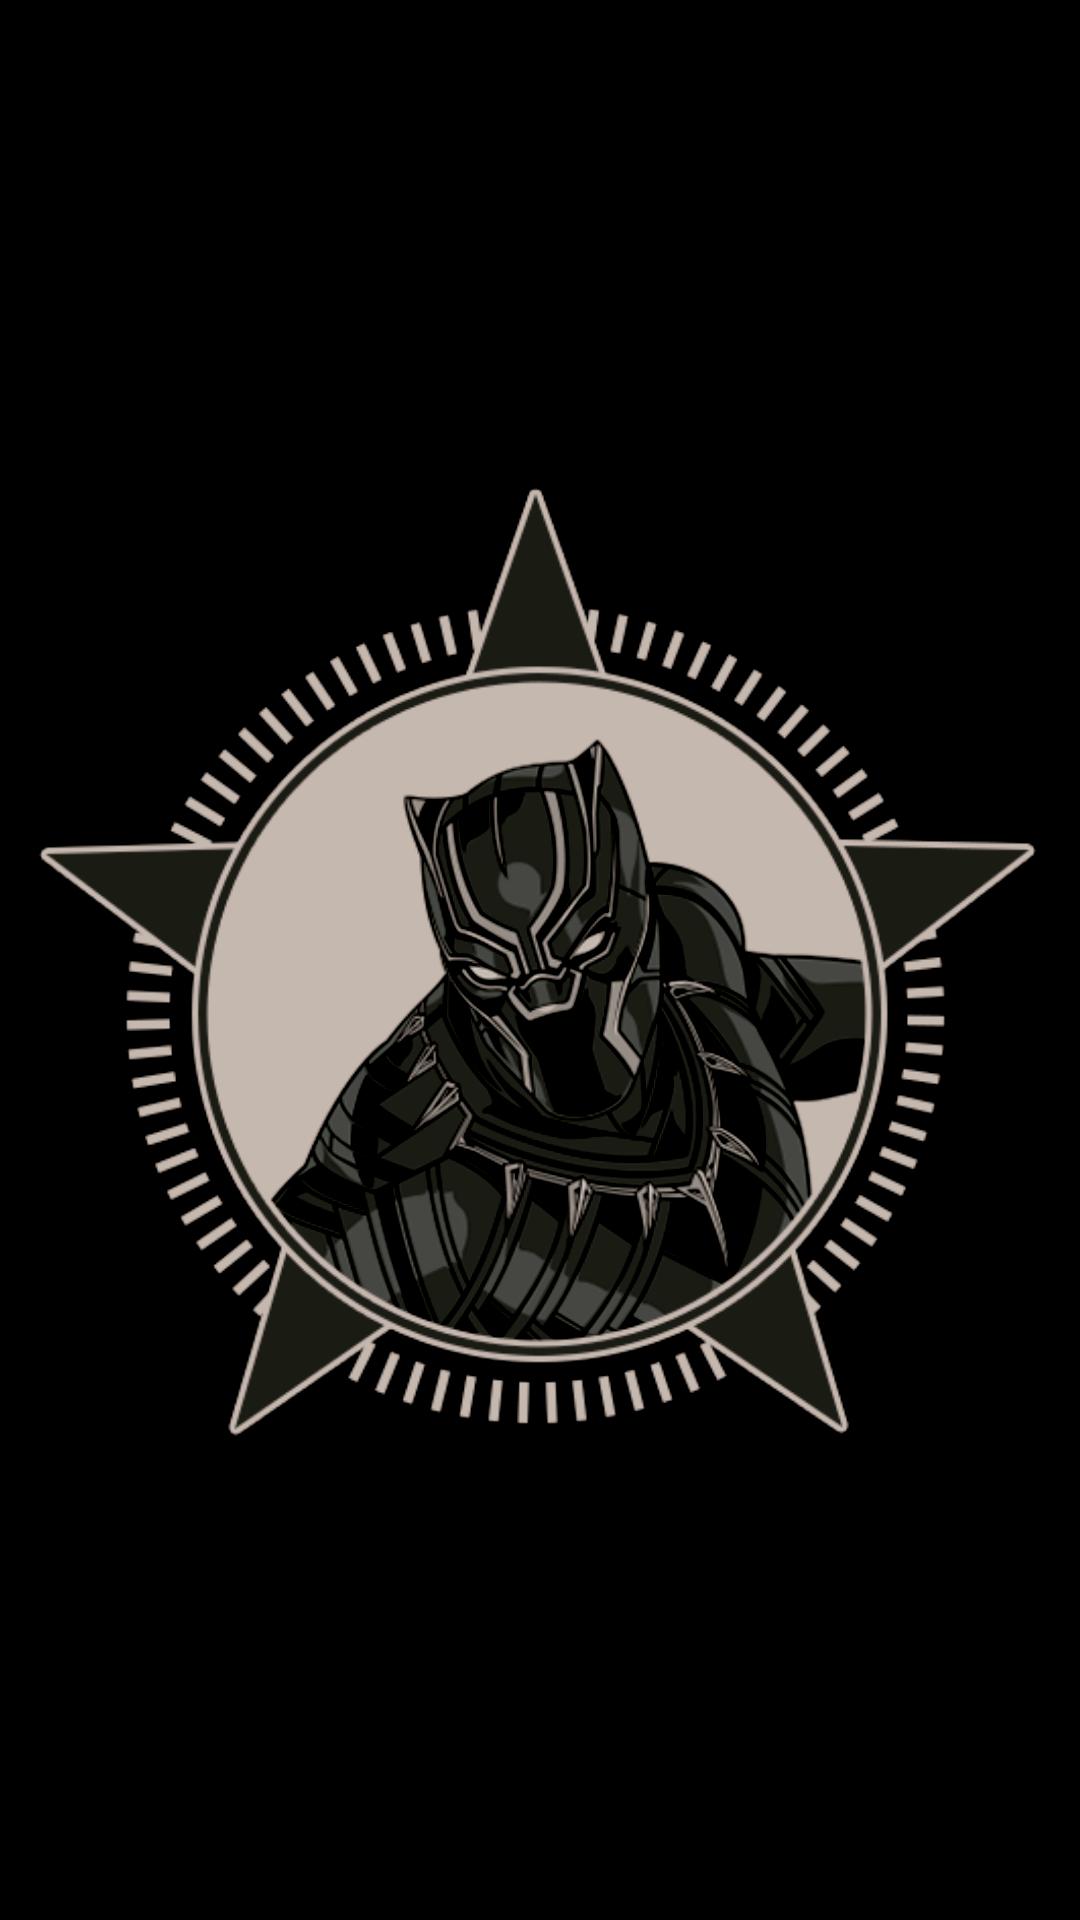 Black Panther Logo Wallpapers - Wallpaper Cave